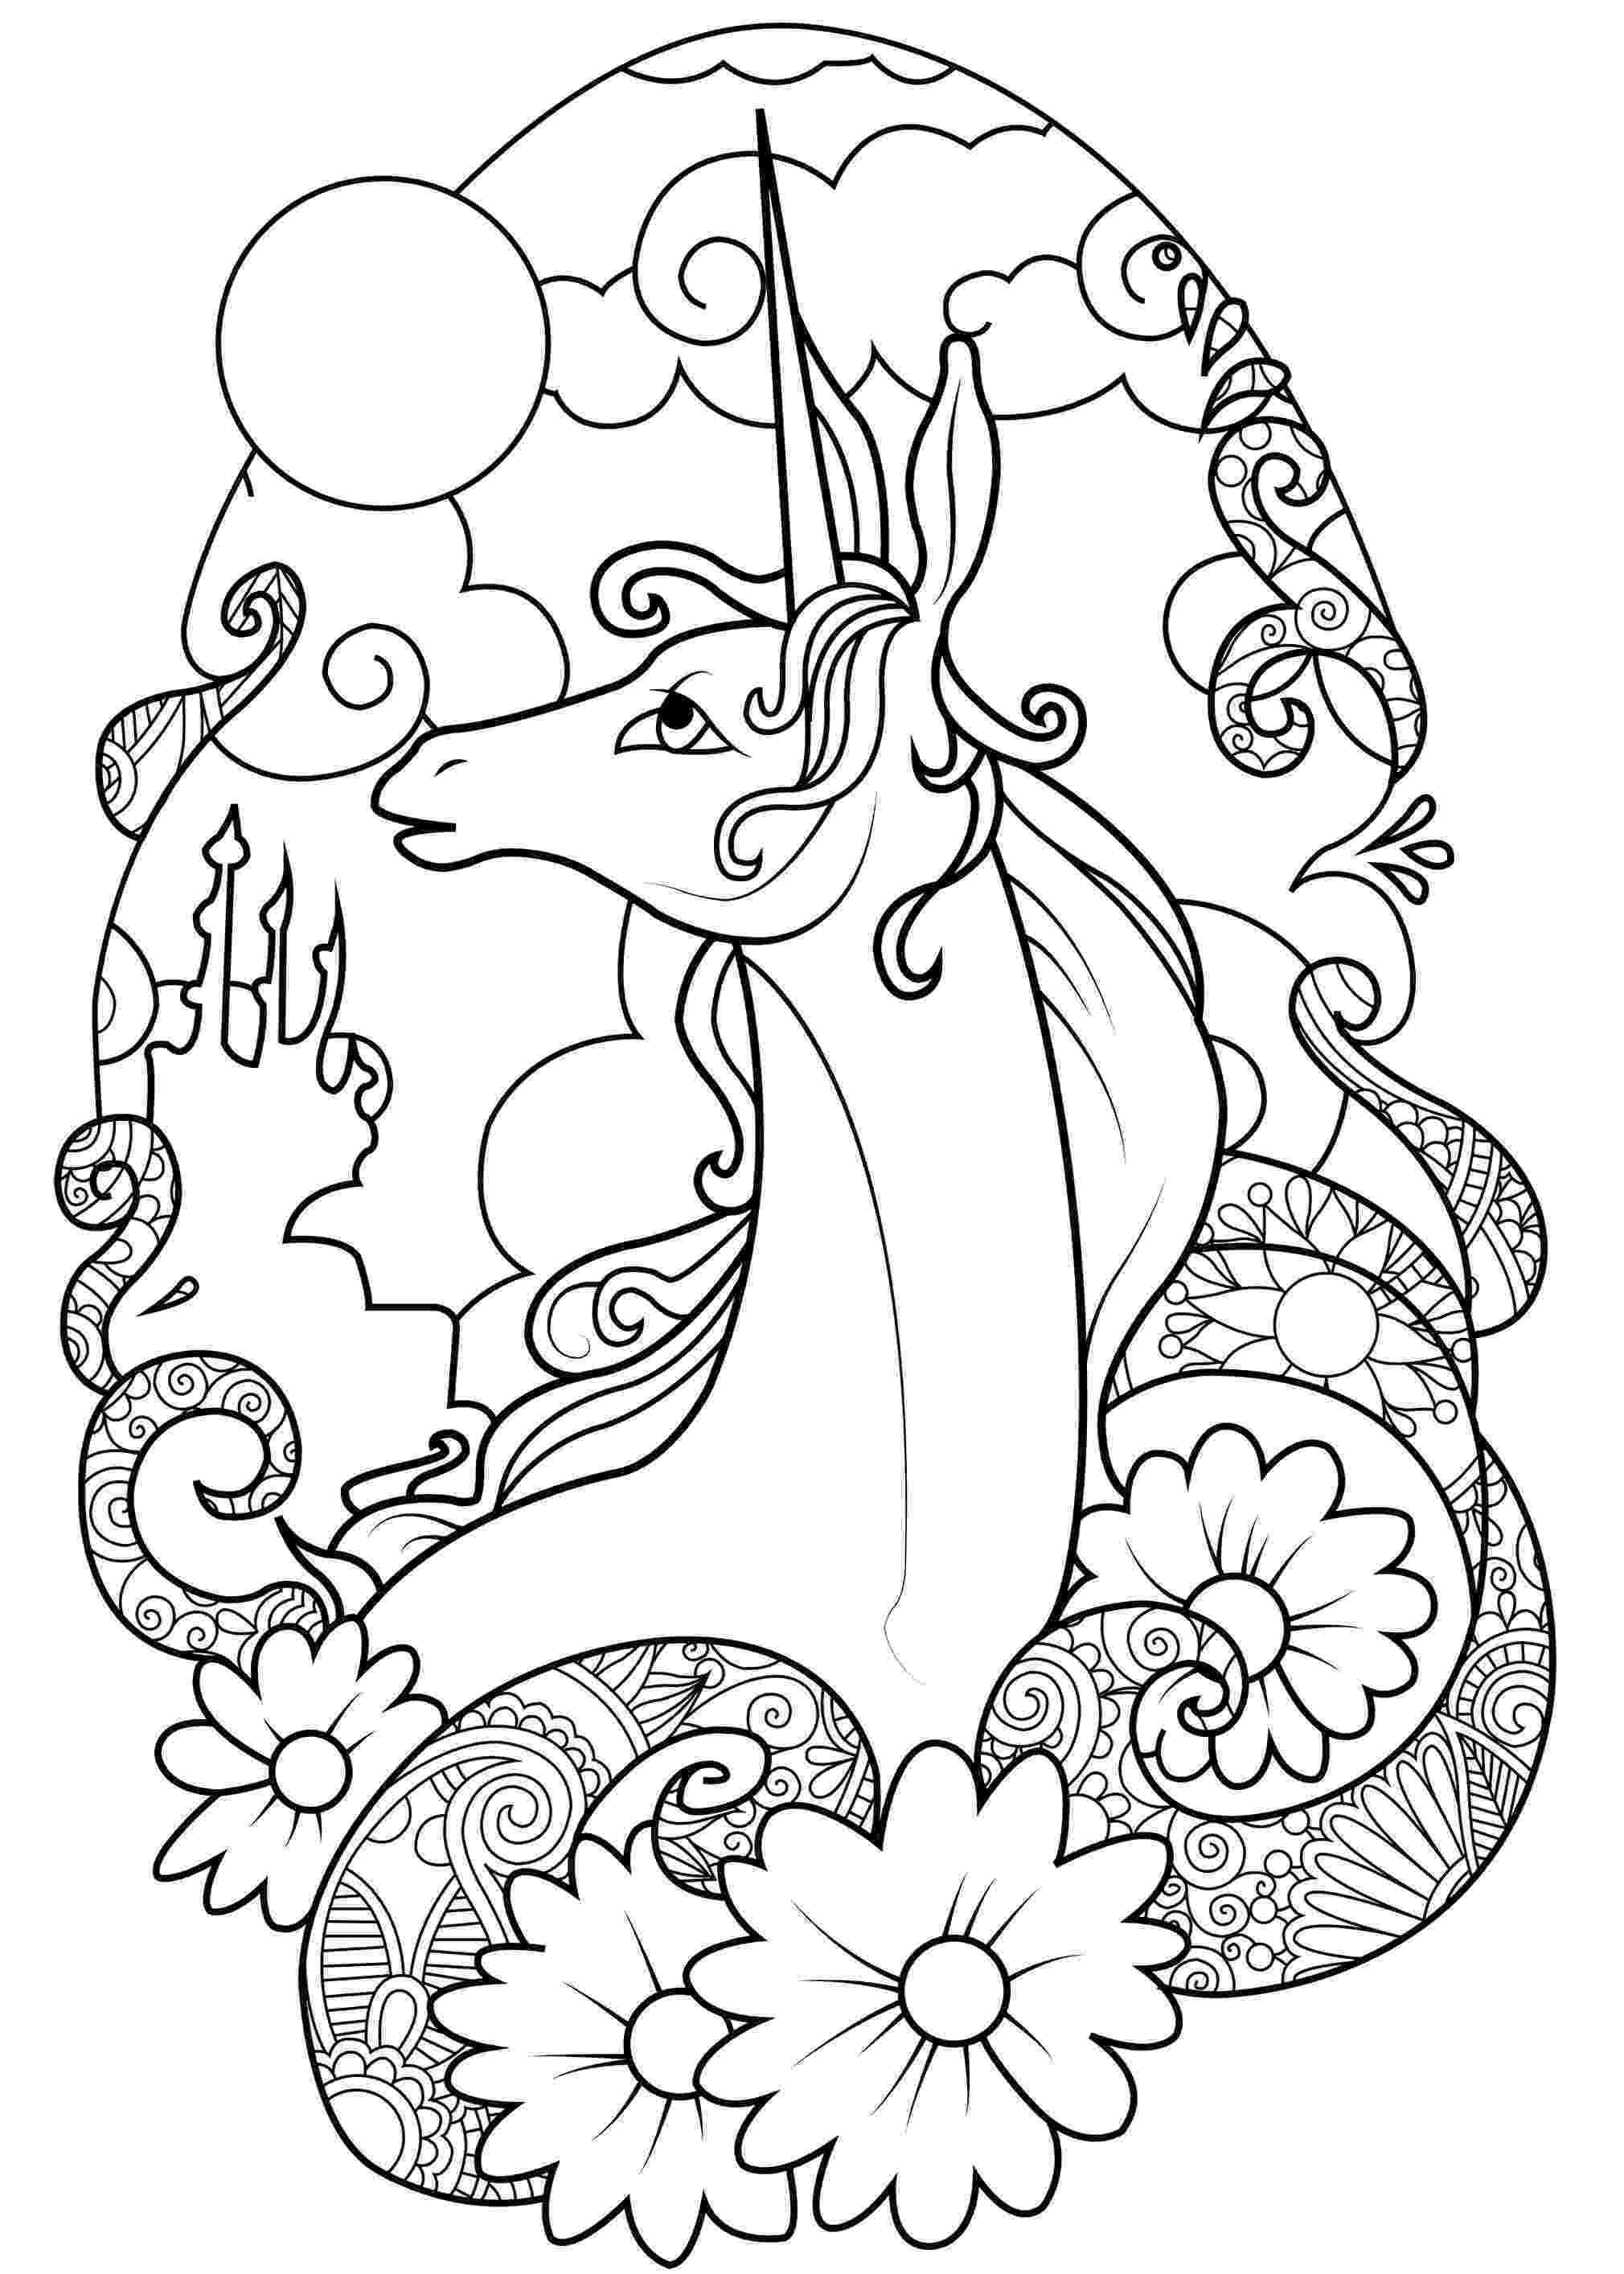 unicorns coloring pages fairy unicorn unicorns adult coloring pages pages unicorns coloring